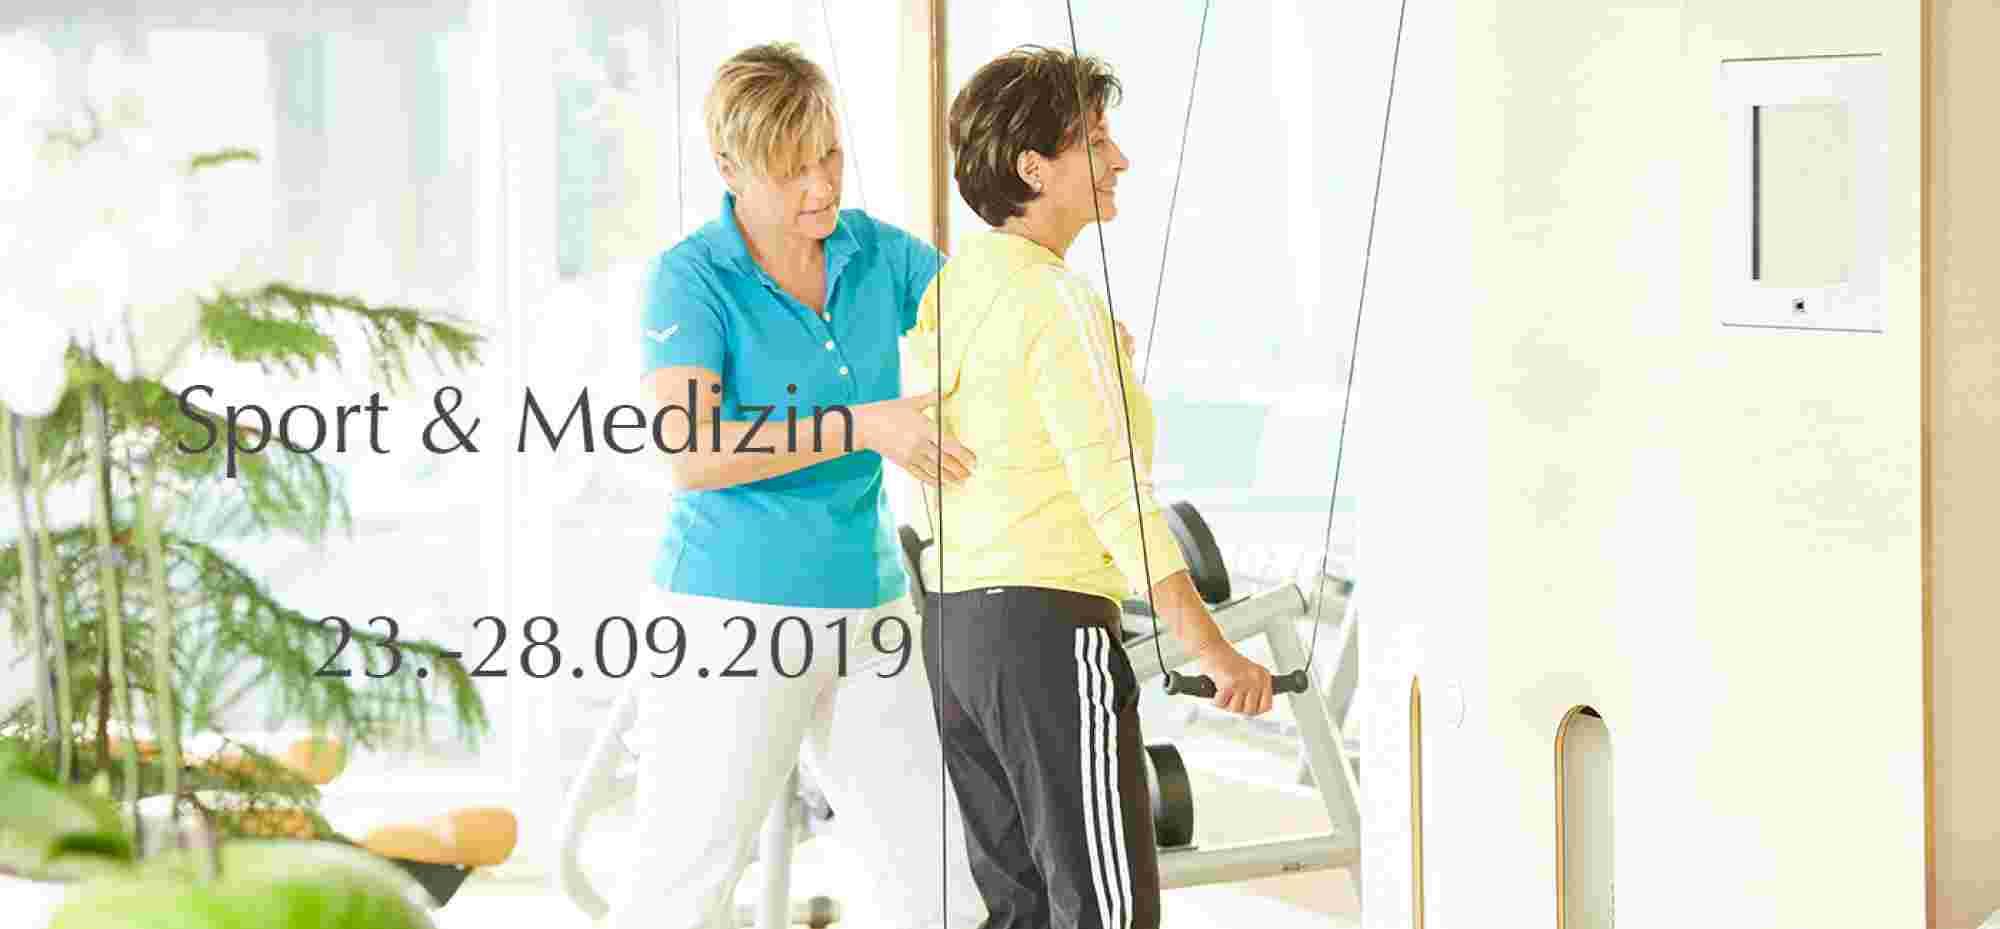 Sport & Medizin